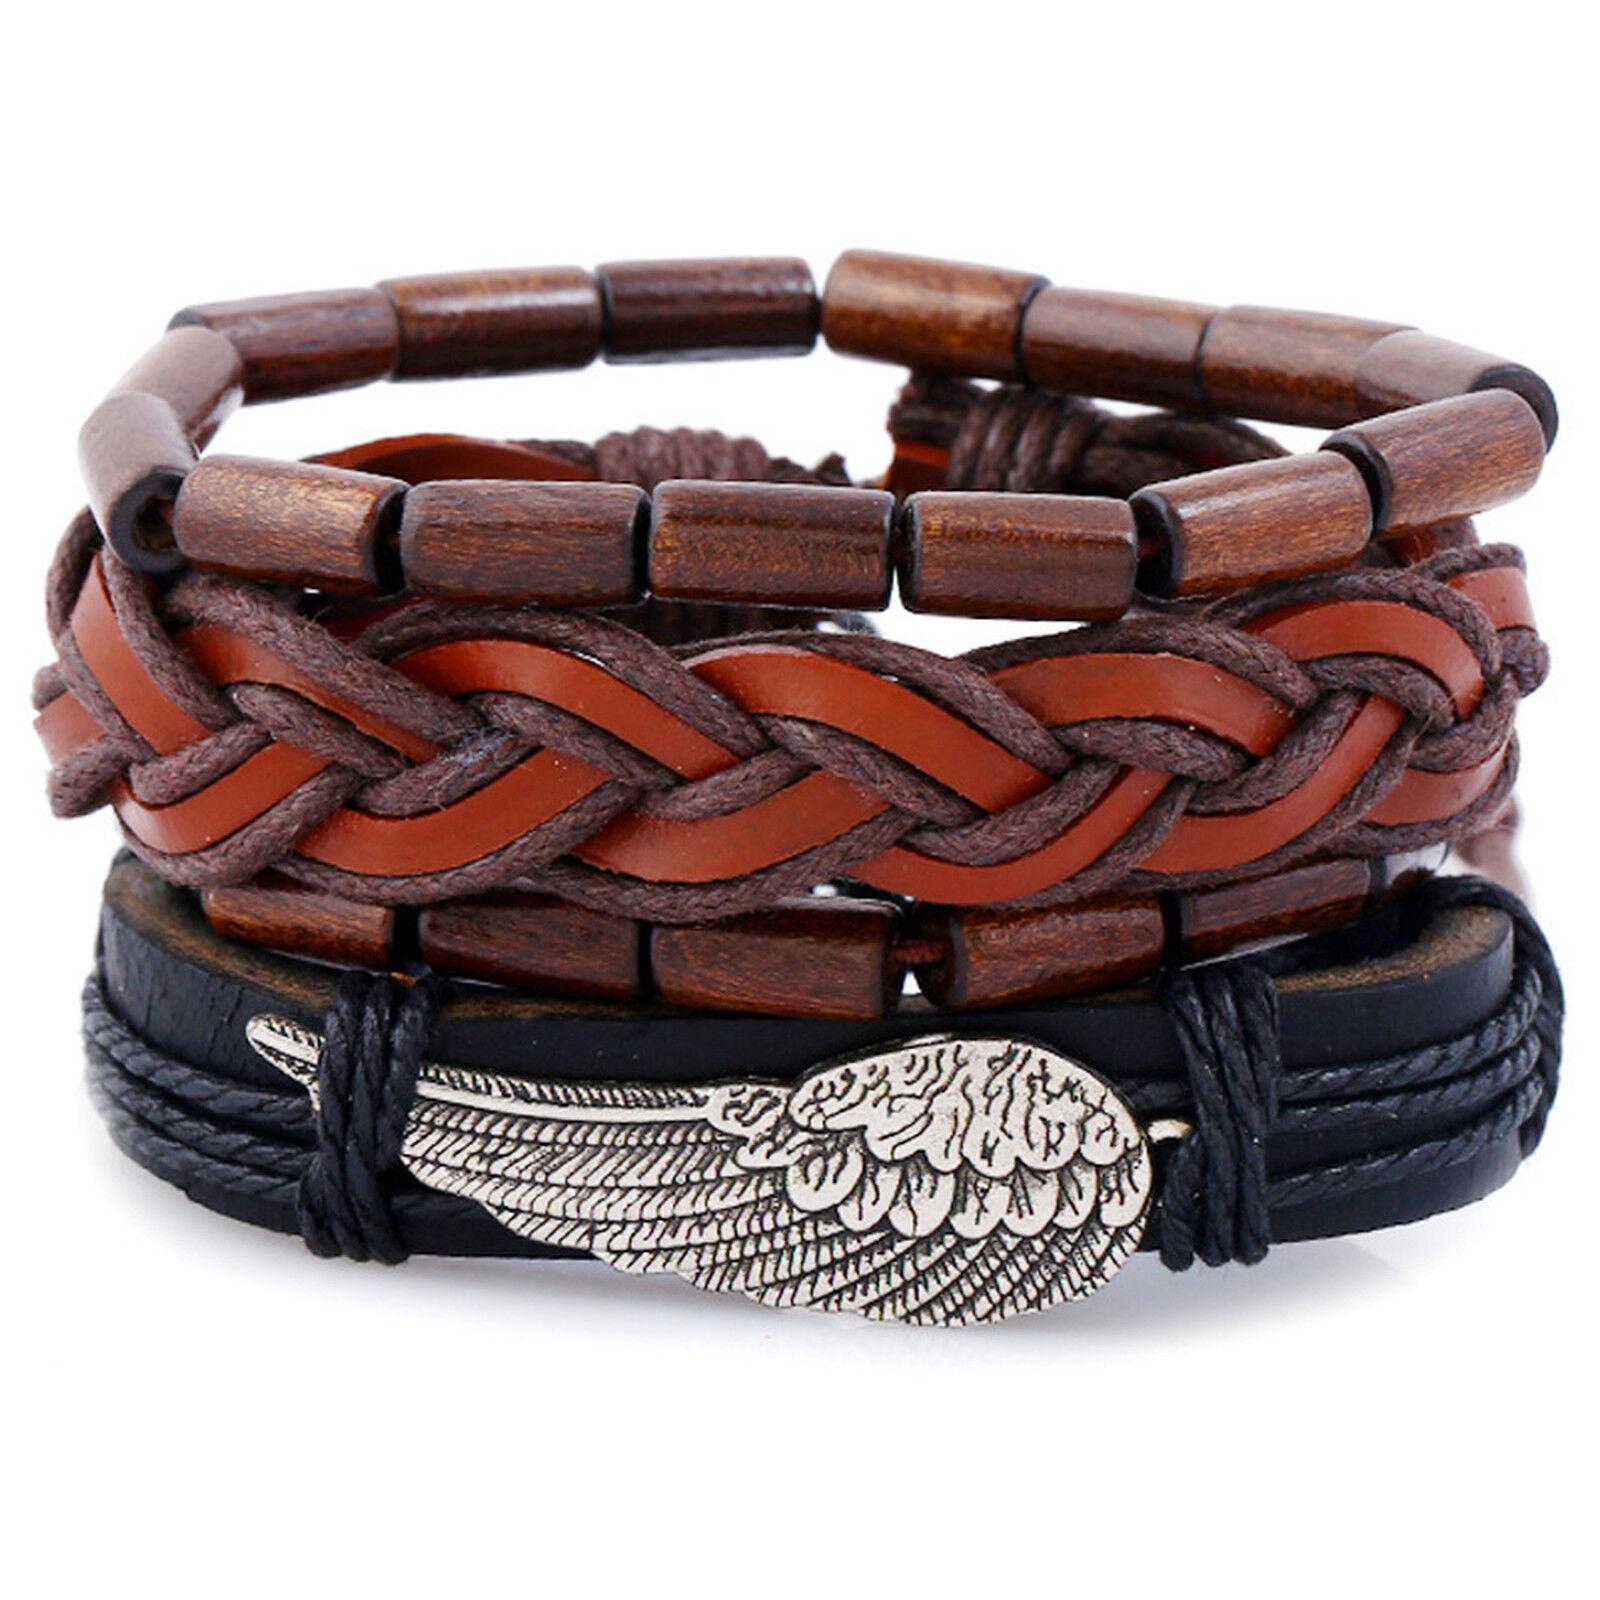 Tribal Wood Beads Angel Wing Leather Mens Womens Wristband Bracelet 4pcs Set Bracelets